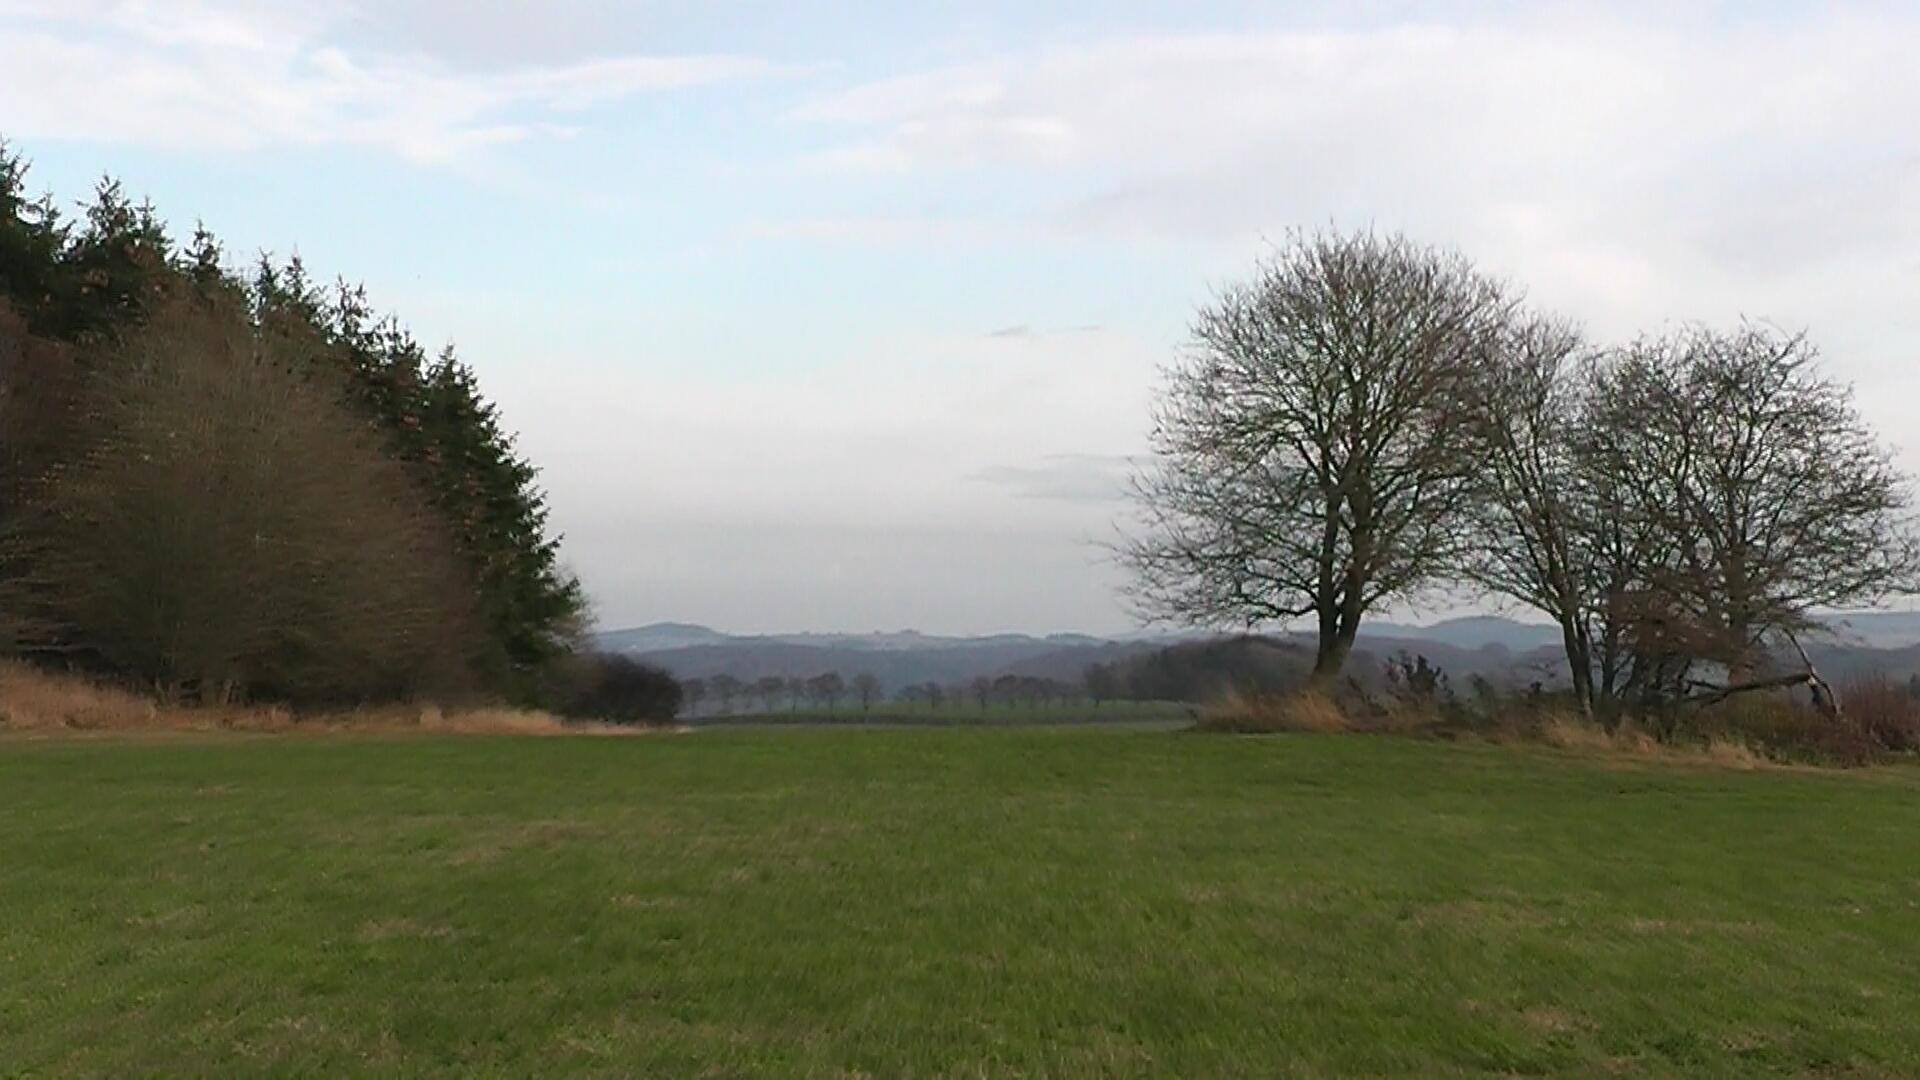 kloster-steinfeld-8